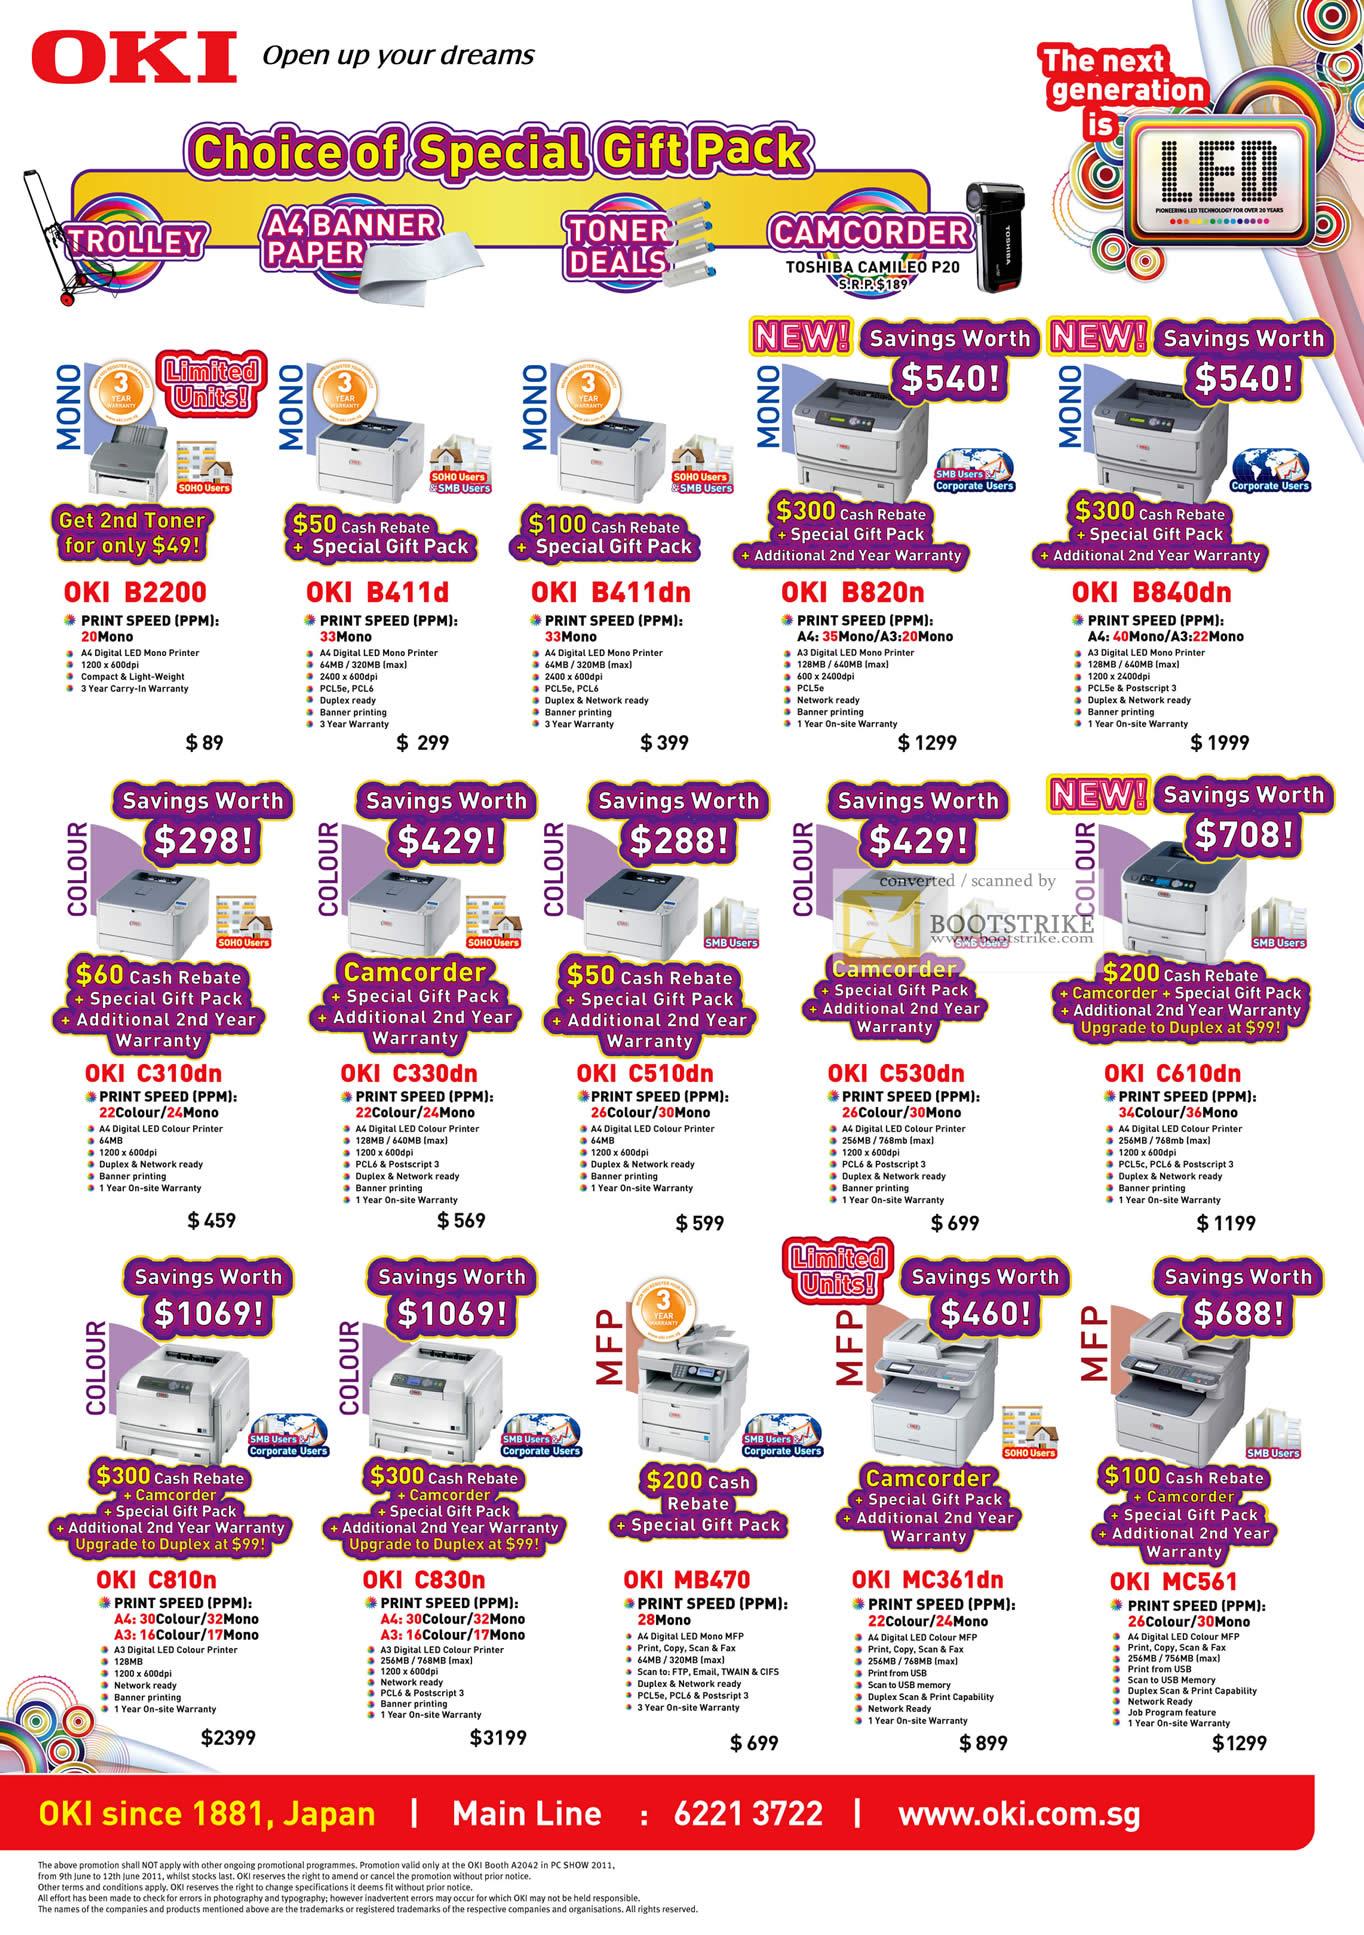 PC Show 2011 price list image brochure of OKI Printers LED Mono Colour B2200 B411d B411dn B820n B840dn C310dn C330dn C510dn C530dn C610dn C810n C830n MB470 MC361dn MC561